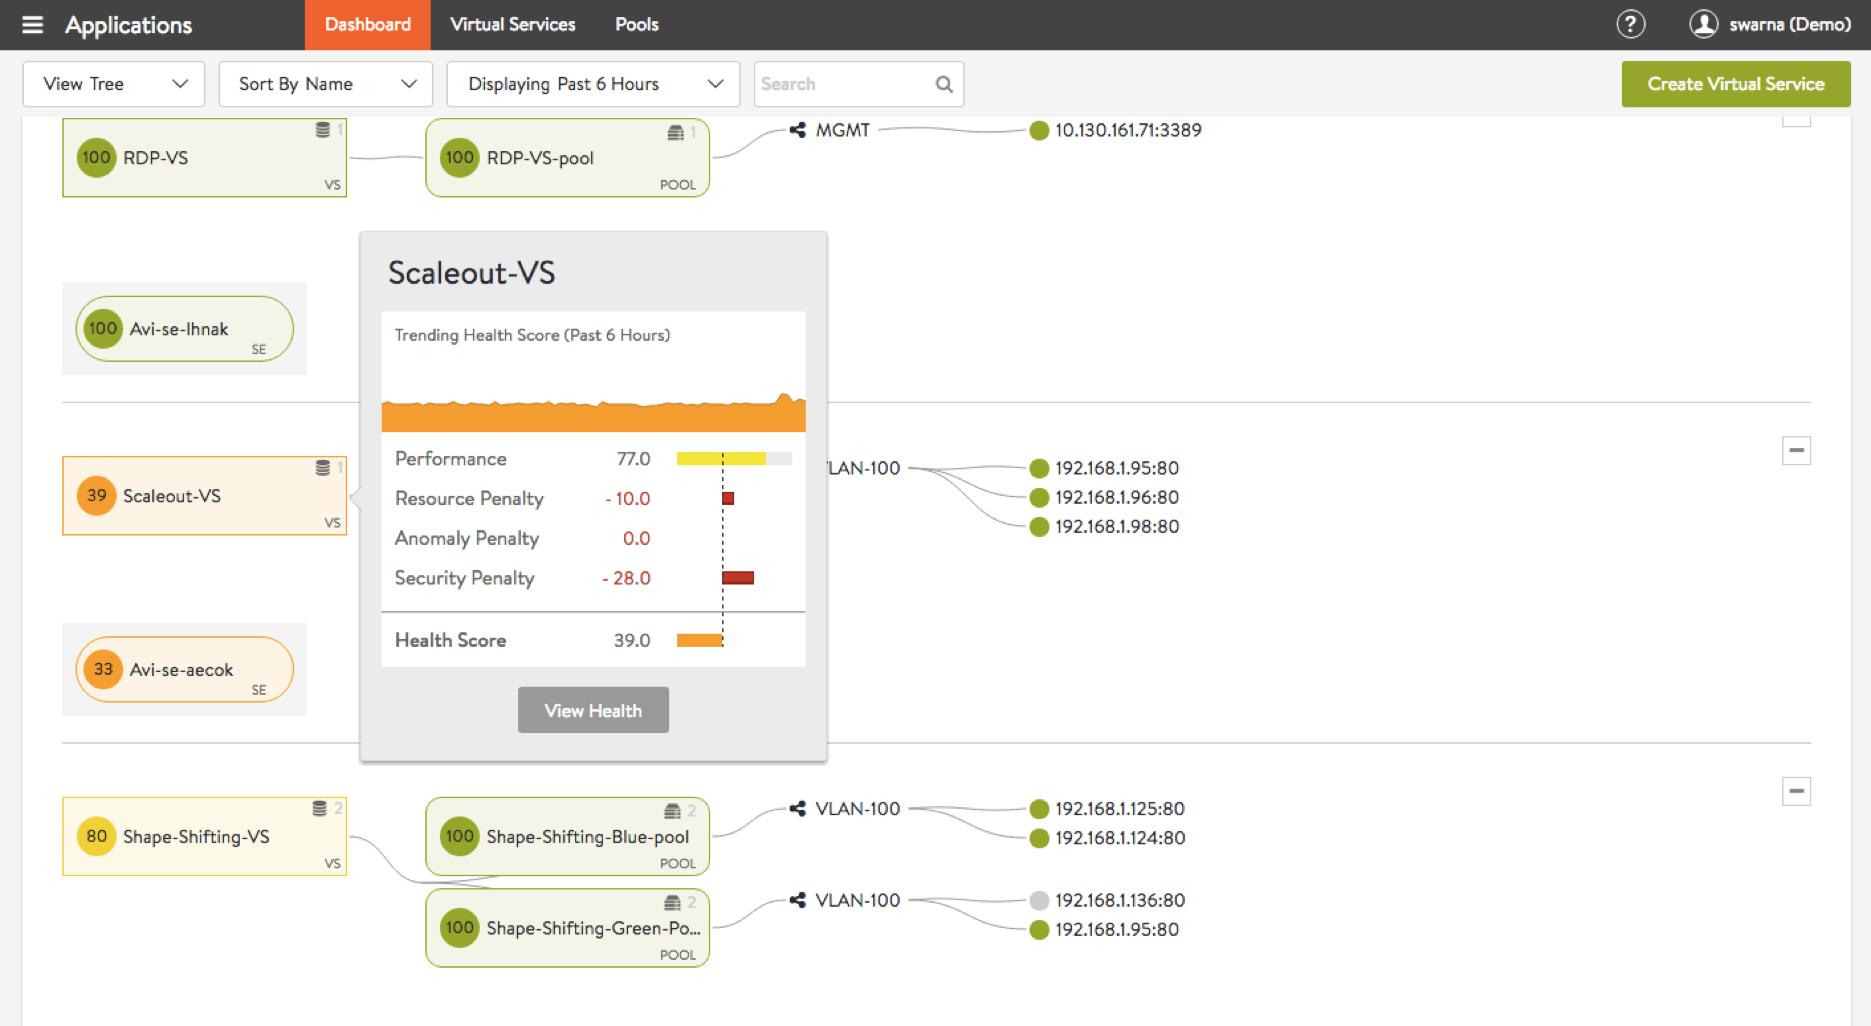 Analytics_HealthScore.png